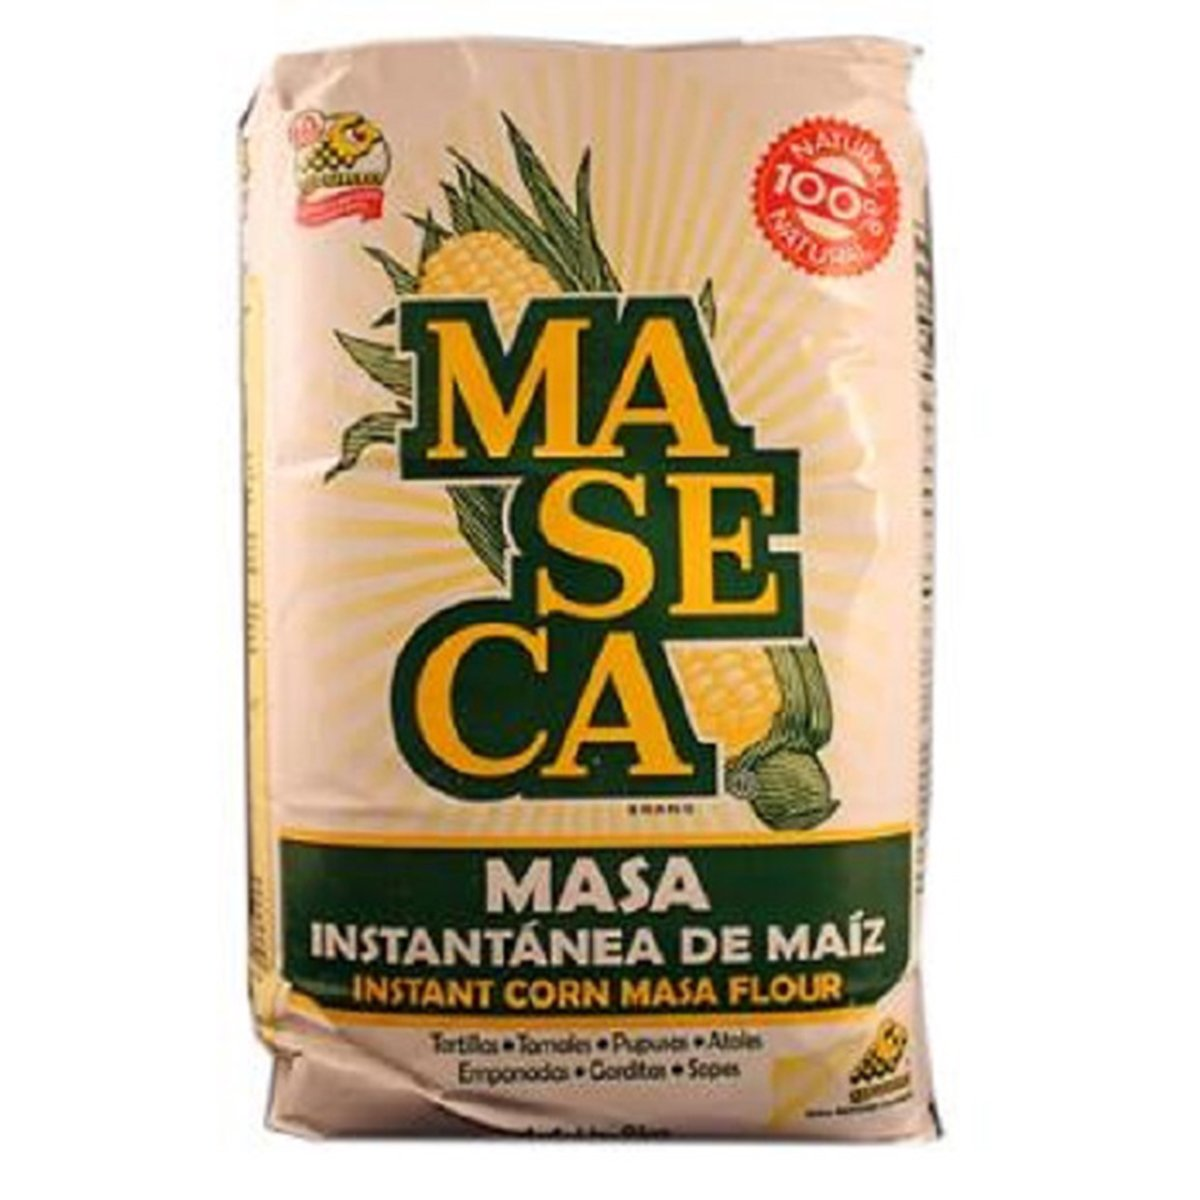 Product Of Maseca, Corn Masa Flour, Count 1 - Flour / Grab Varieties & Flavors